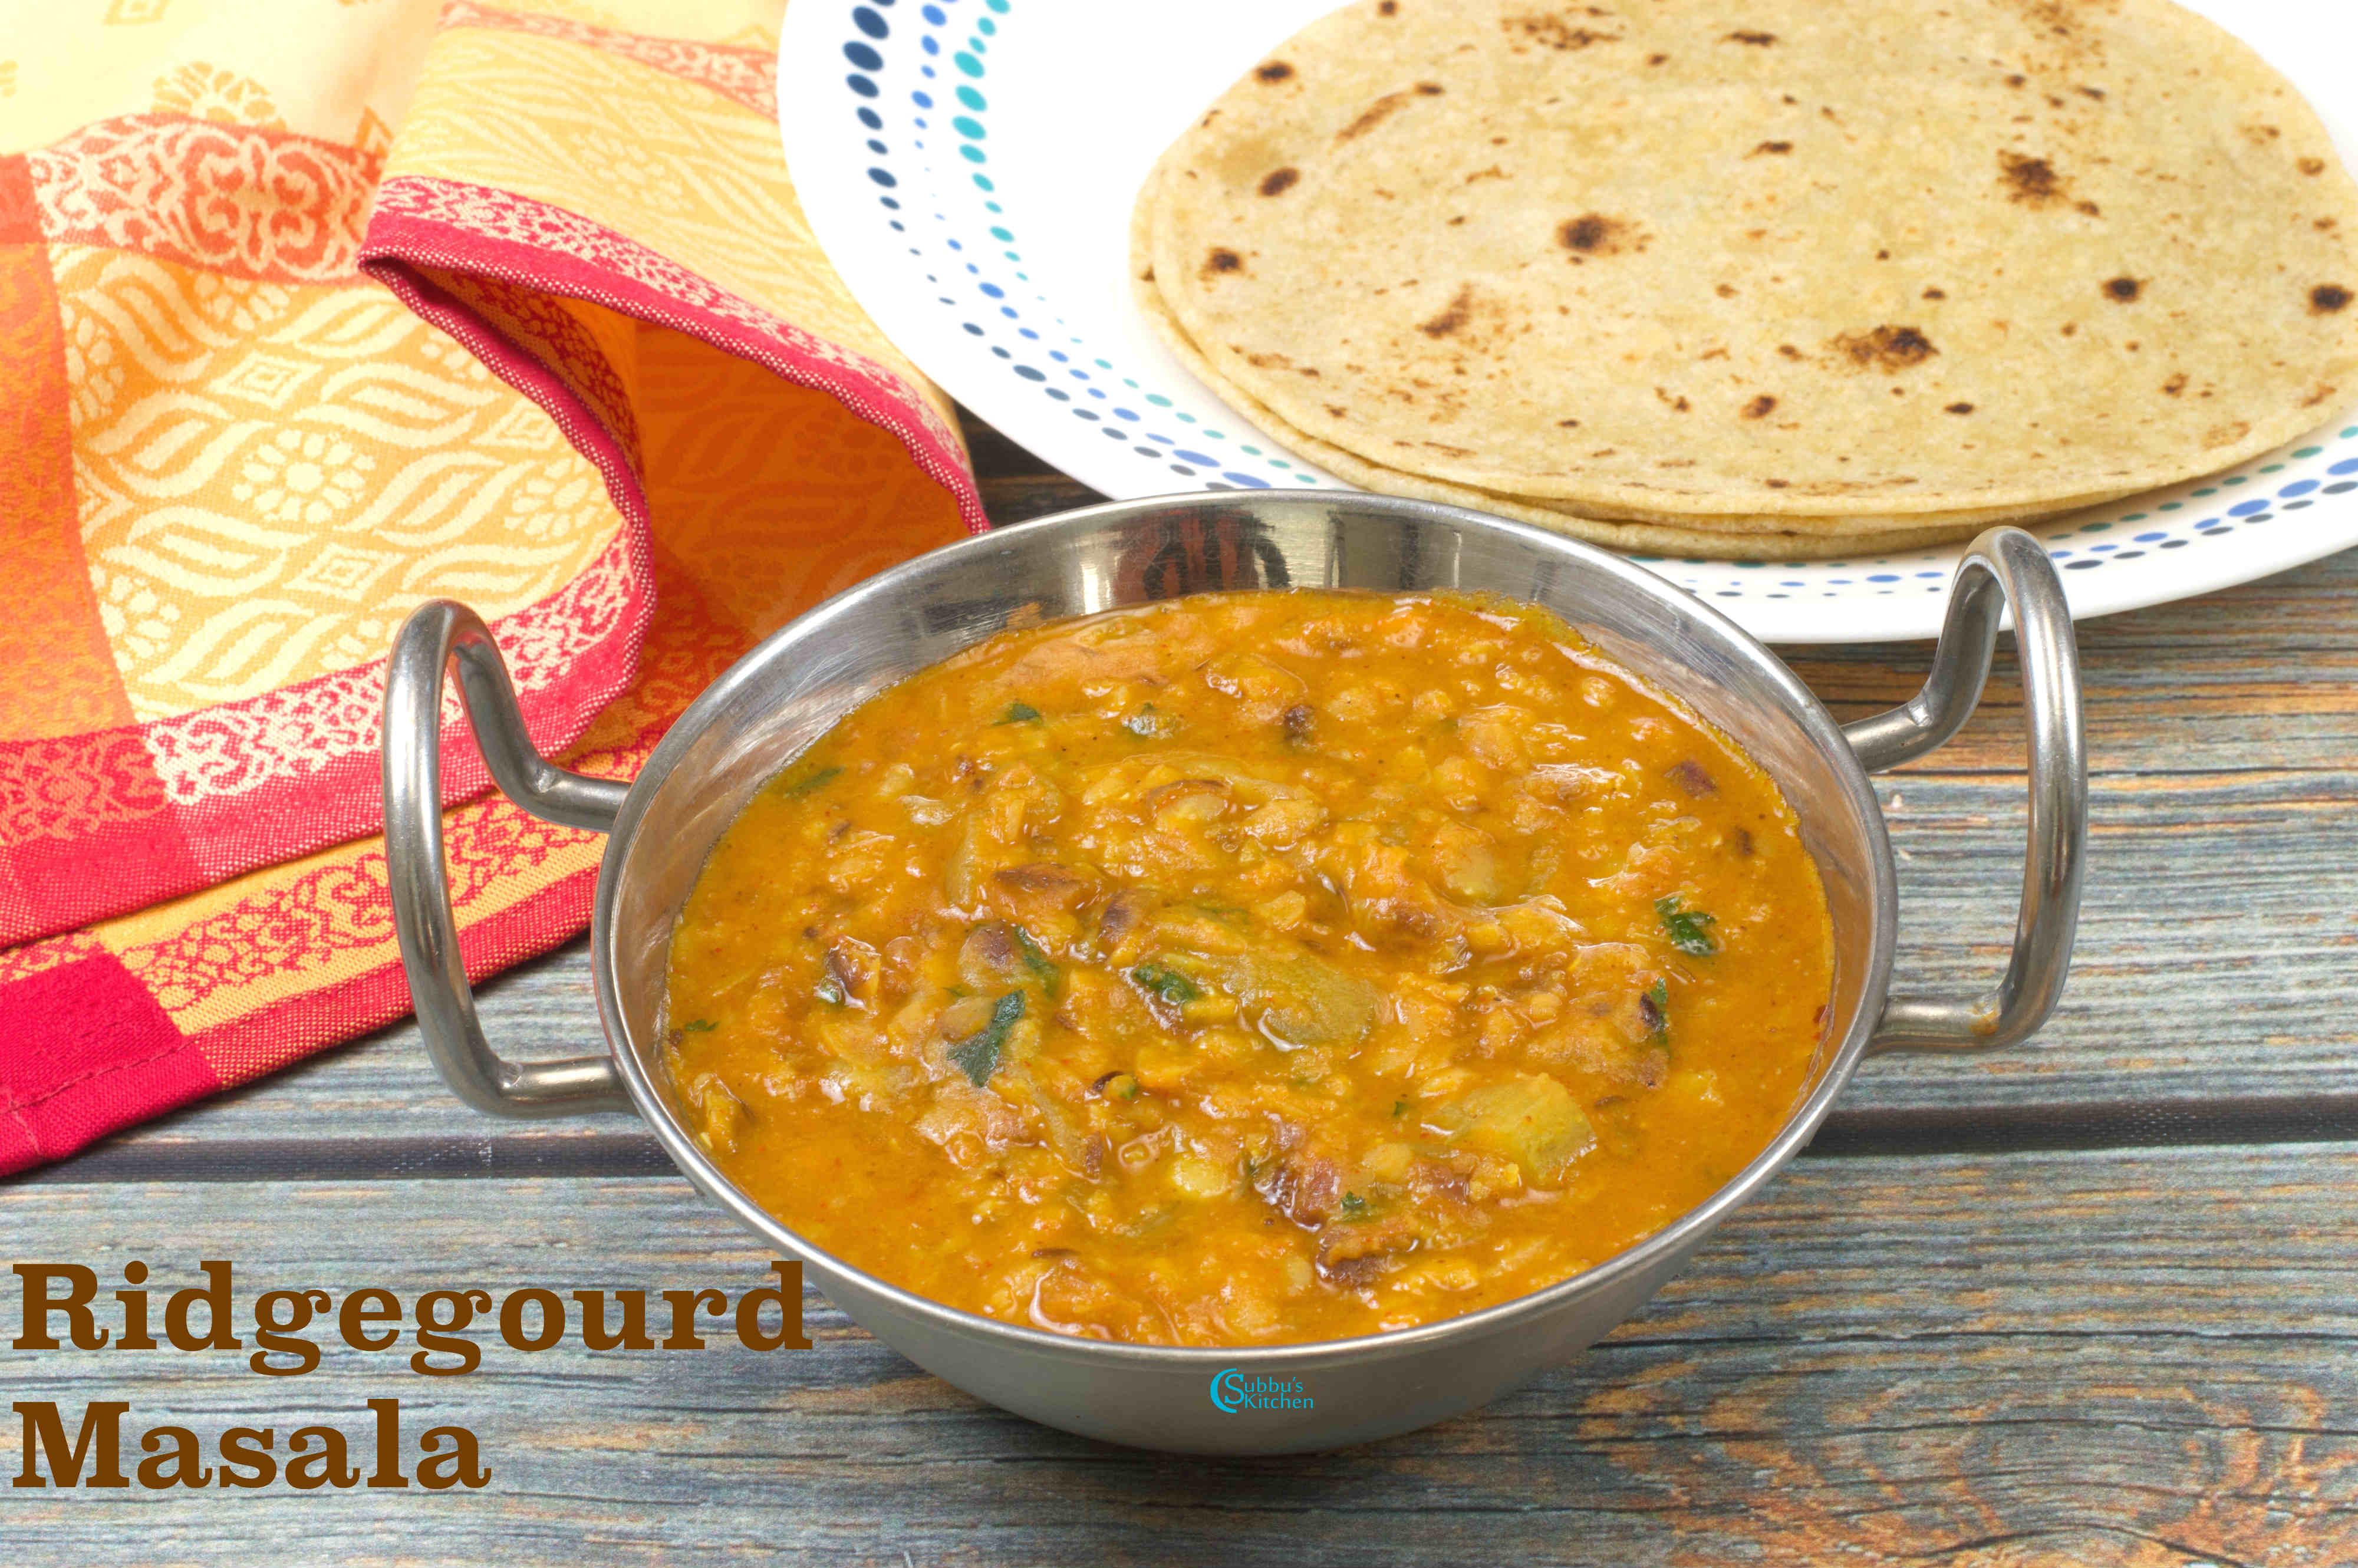 Ridge Gourd Masala Curry   Turai Ki Sabzi